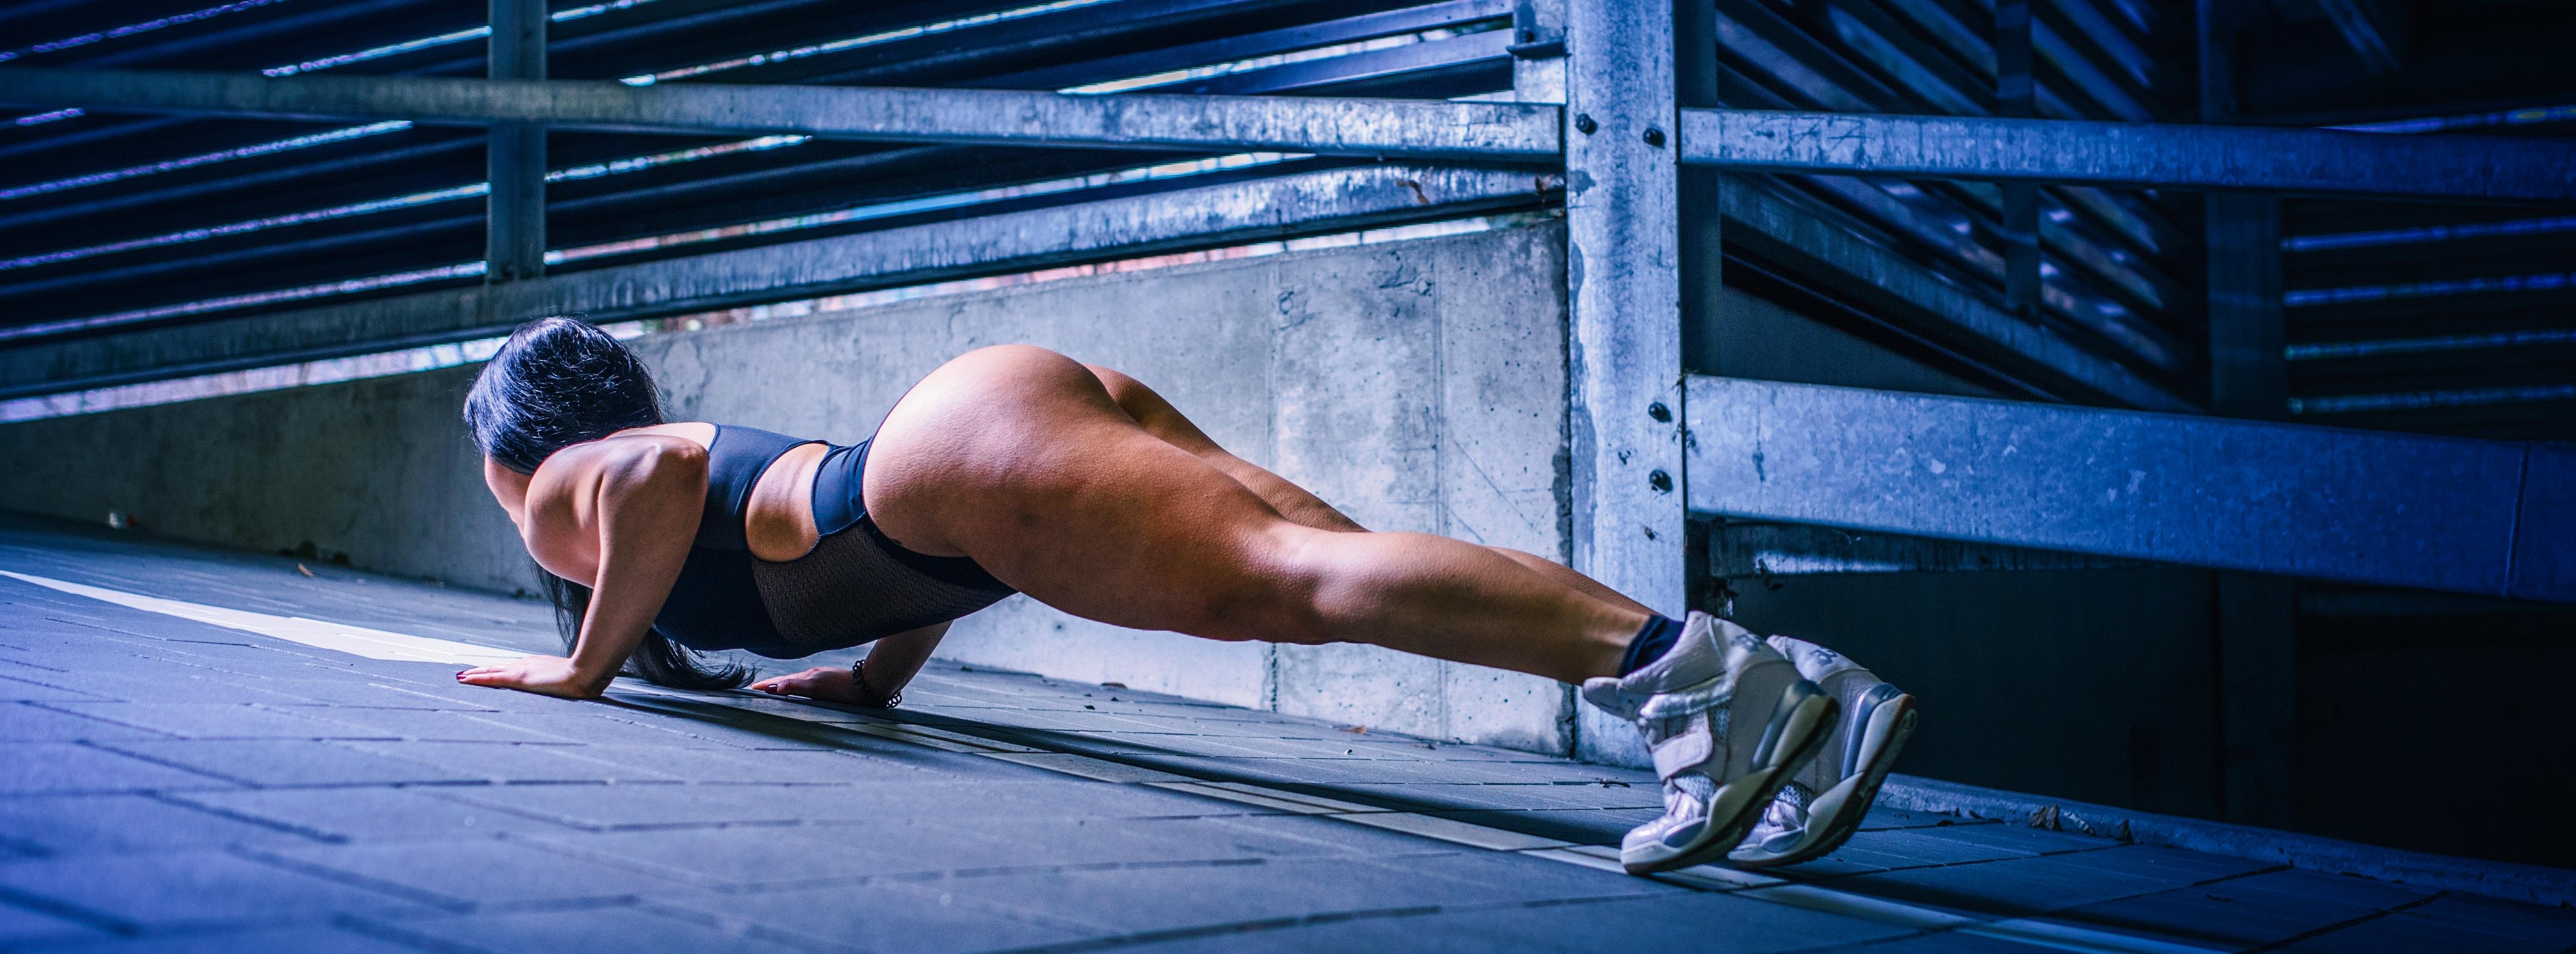 Buket_Oezcan_Wellness_Athlete